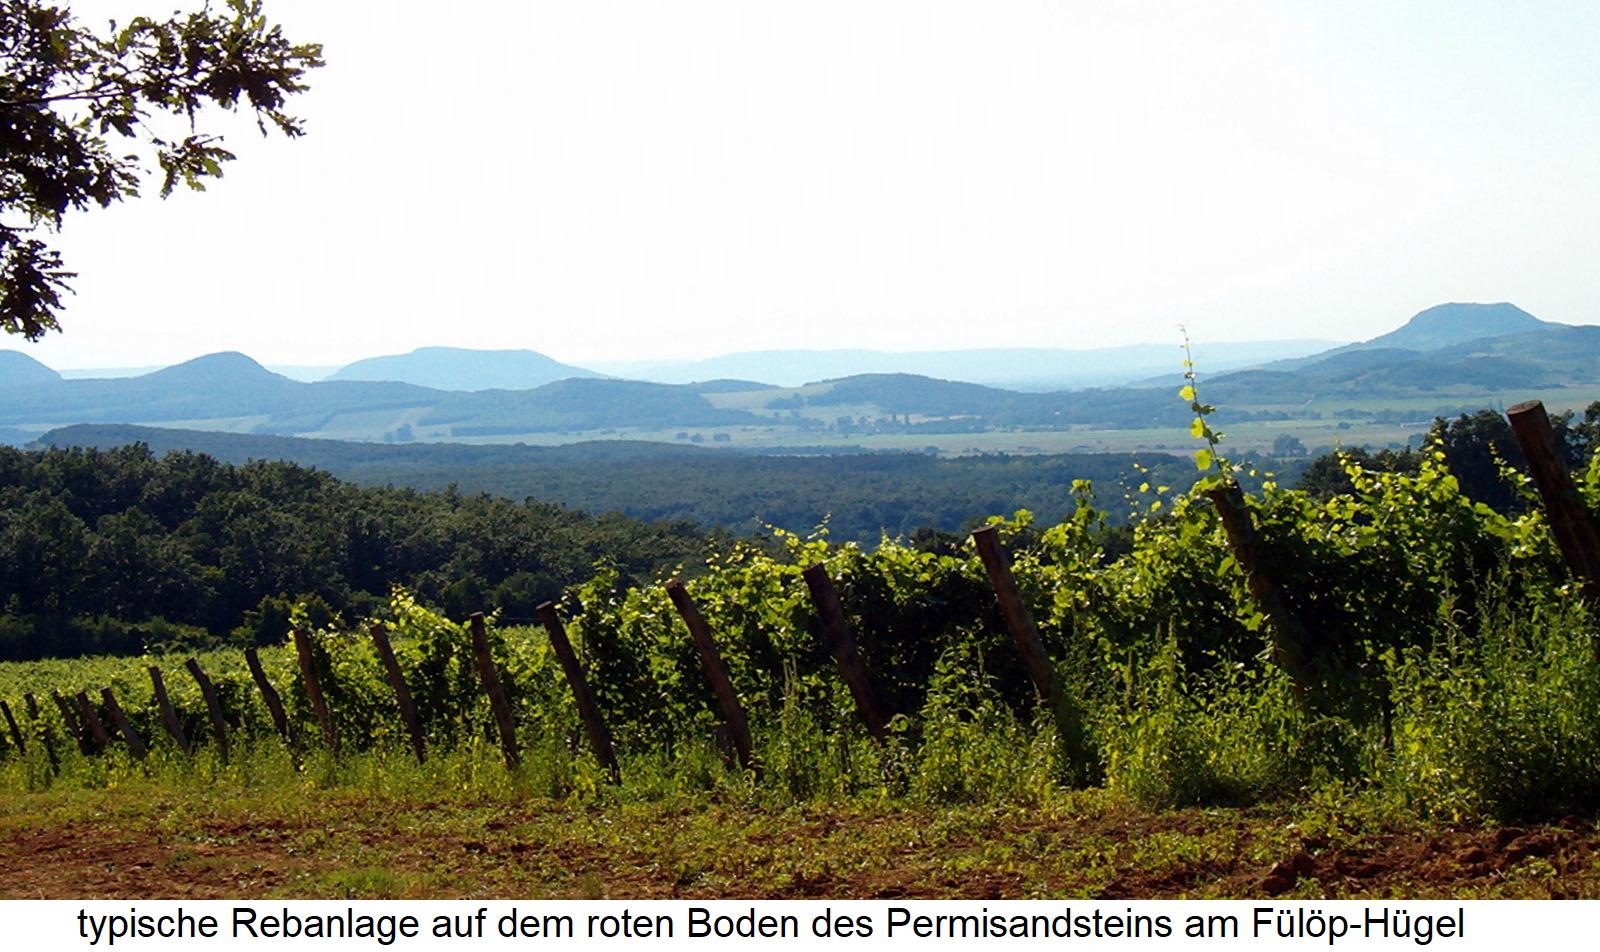 Balatonfelvidßek - typical vineyard on the red soil of the Permisandstein at the Fülöp hill